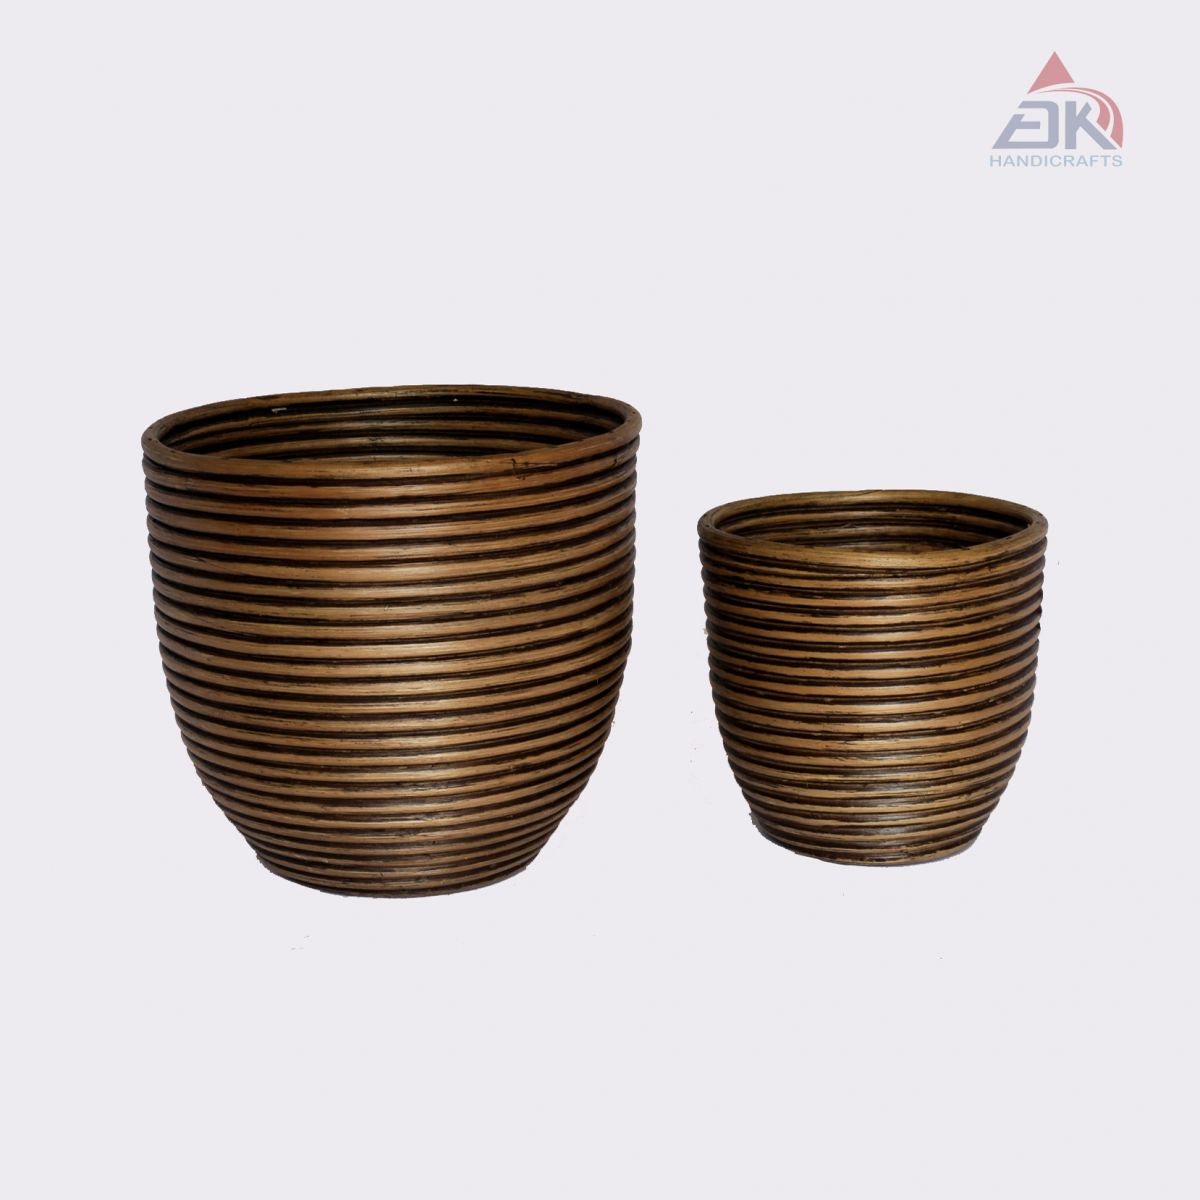 Coiled Planter Pot S/2 # DK47